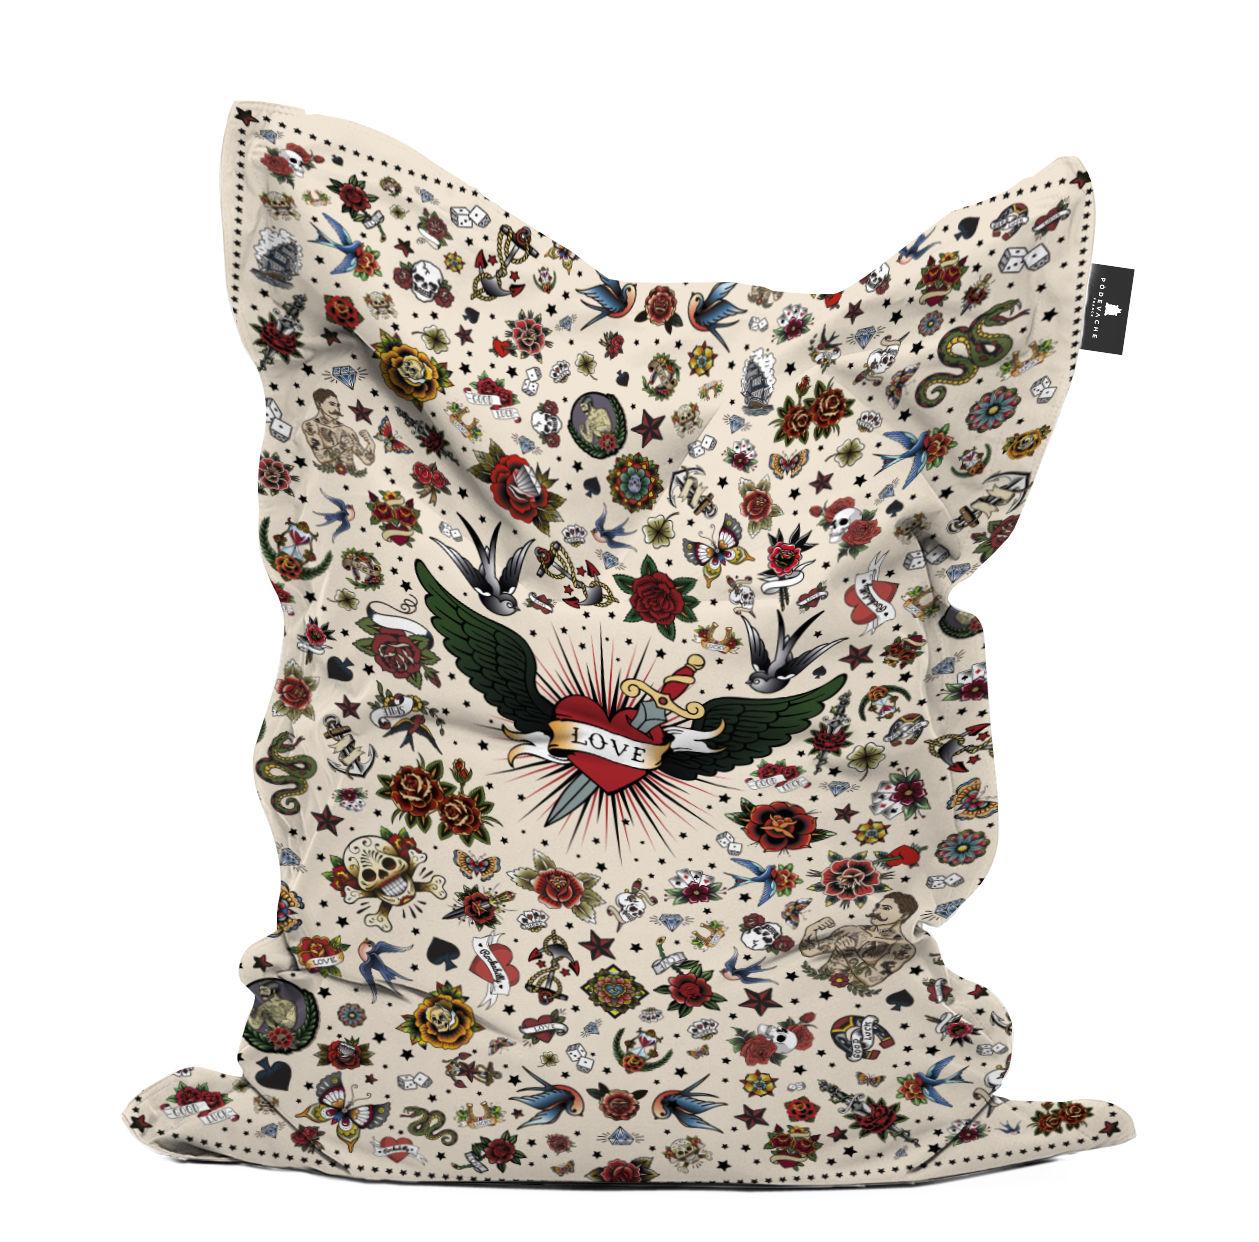 Mobilier - Poufs - Pouf Tatoo Love / Polyester - 140 x 180 cm - PÔDEVACHE - Multicolore - Polyester